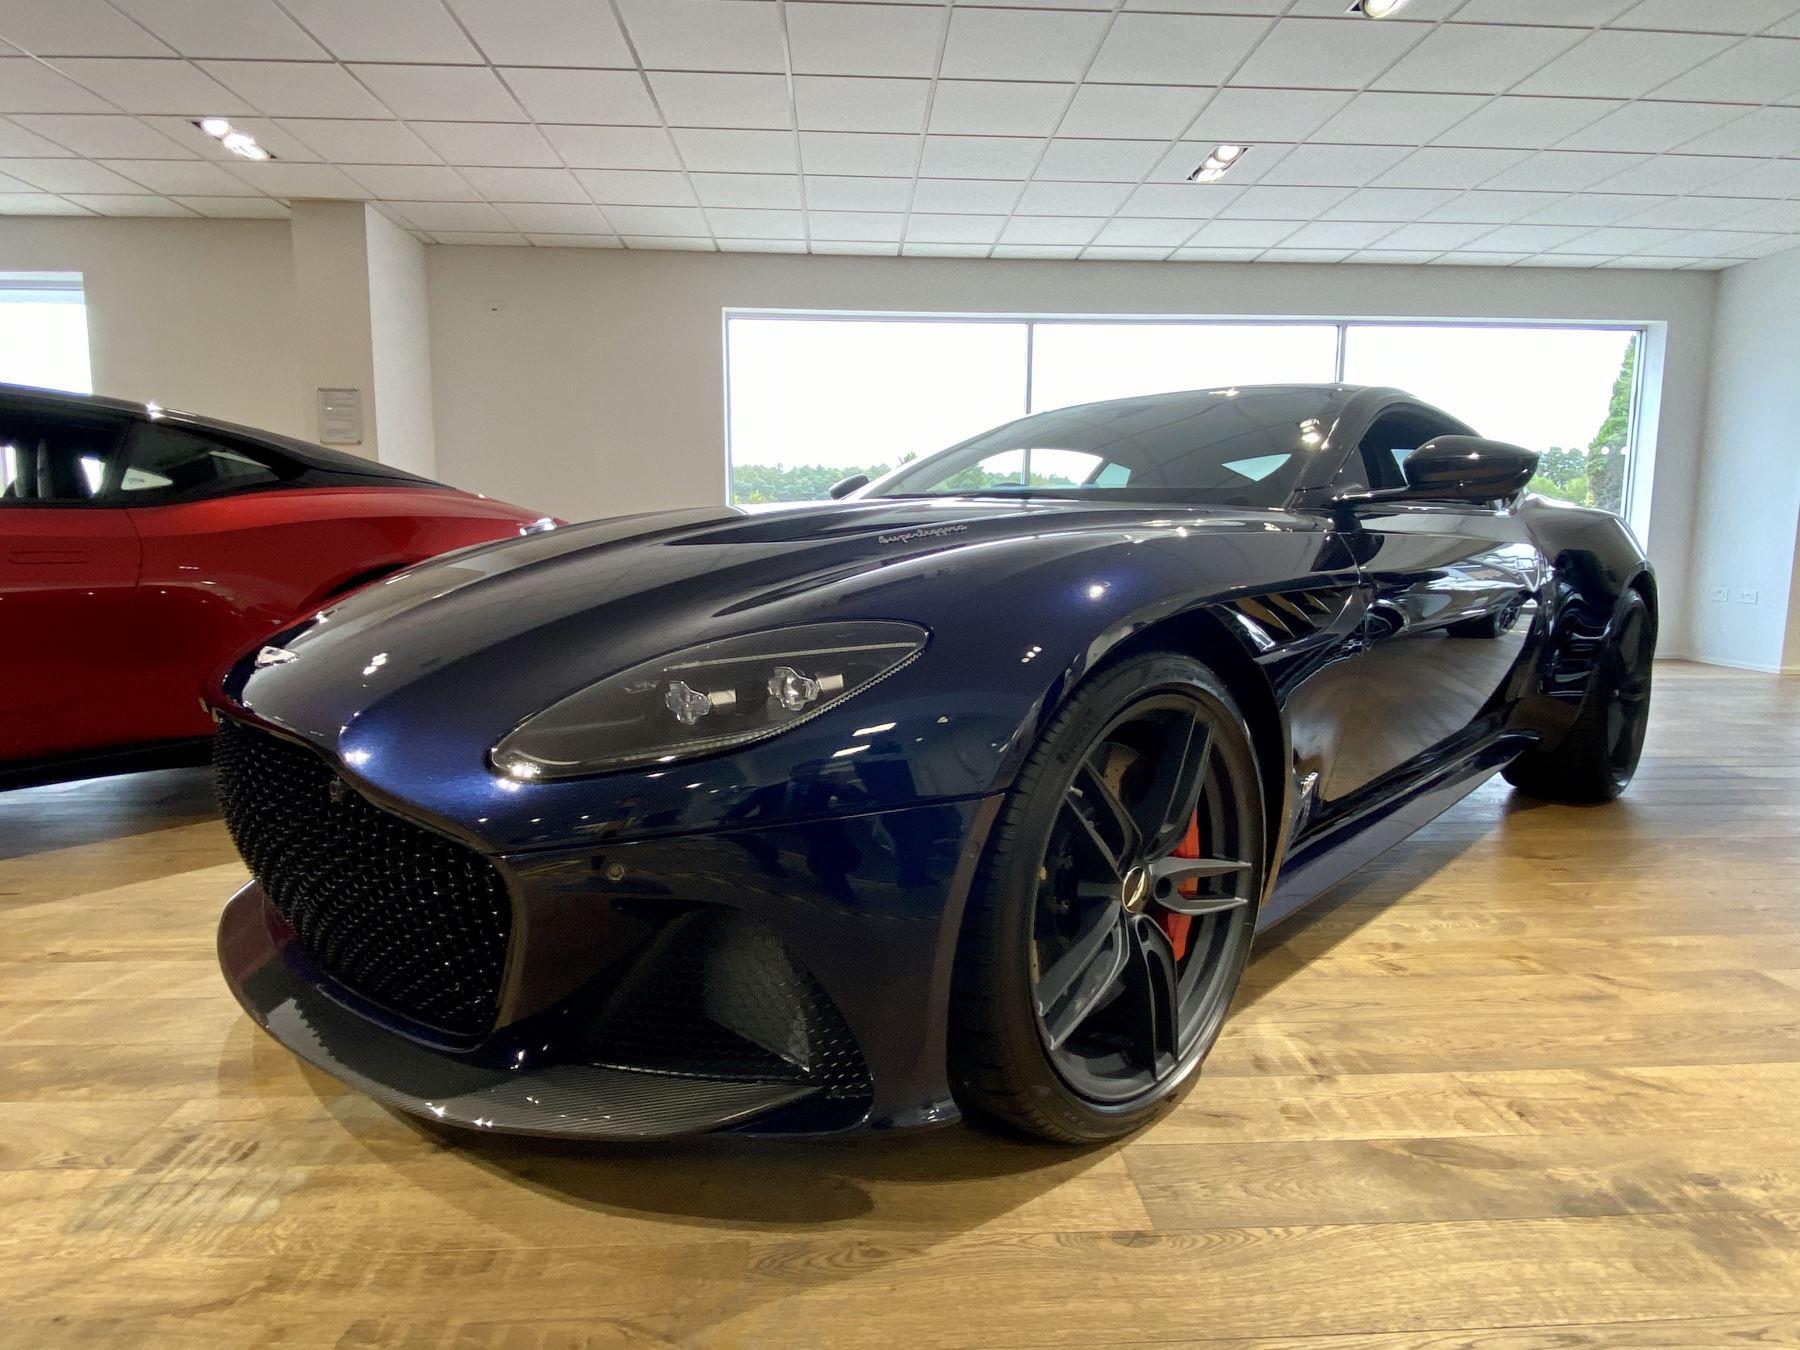 Aston Martin DBS V12 Superleggera Touchtronic 5.2 Automatic 2 door Coupe